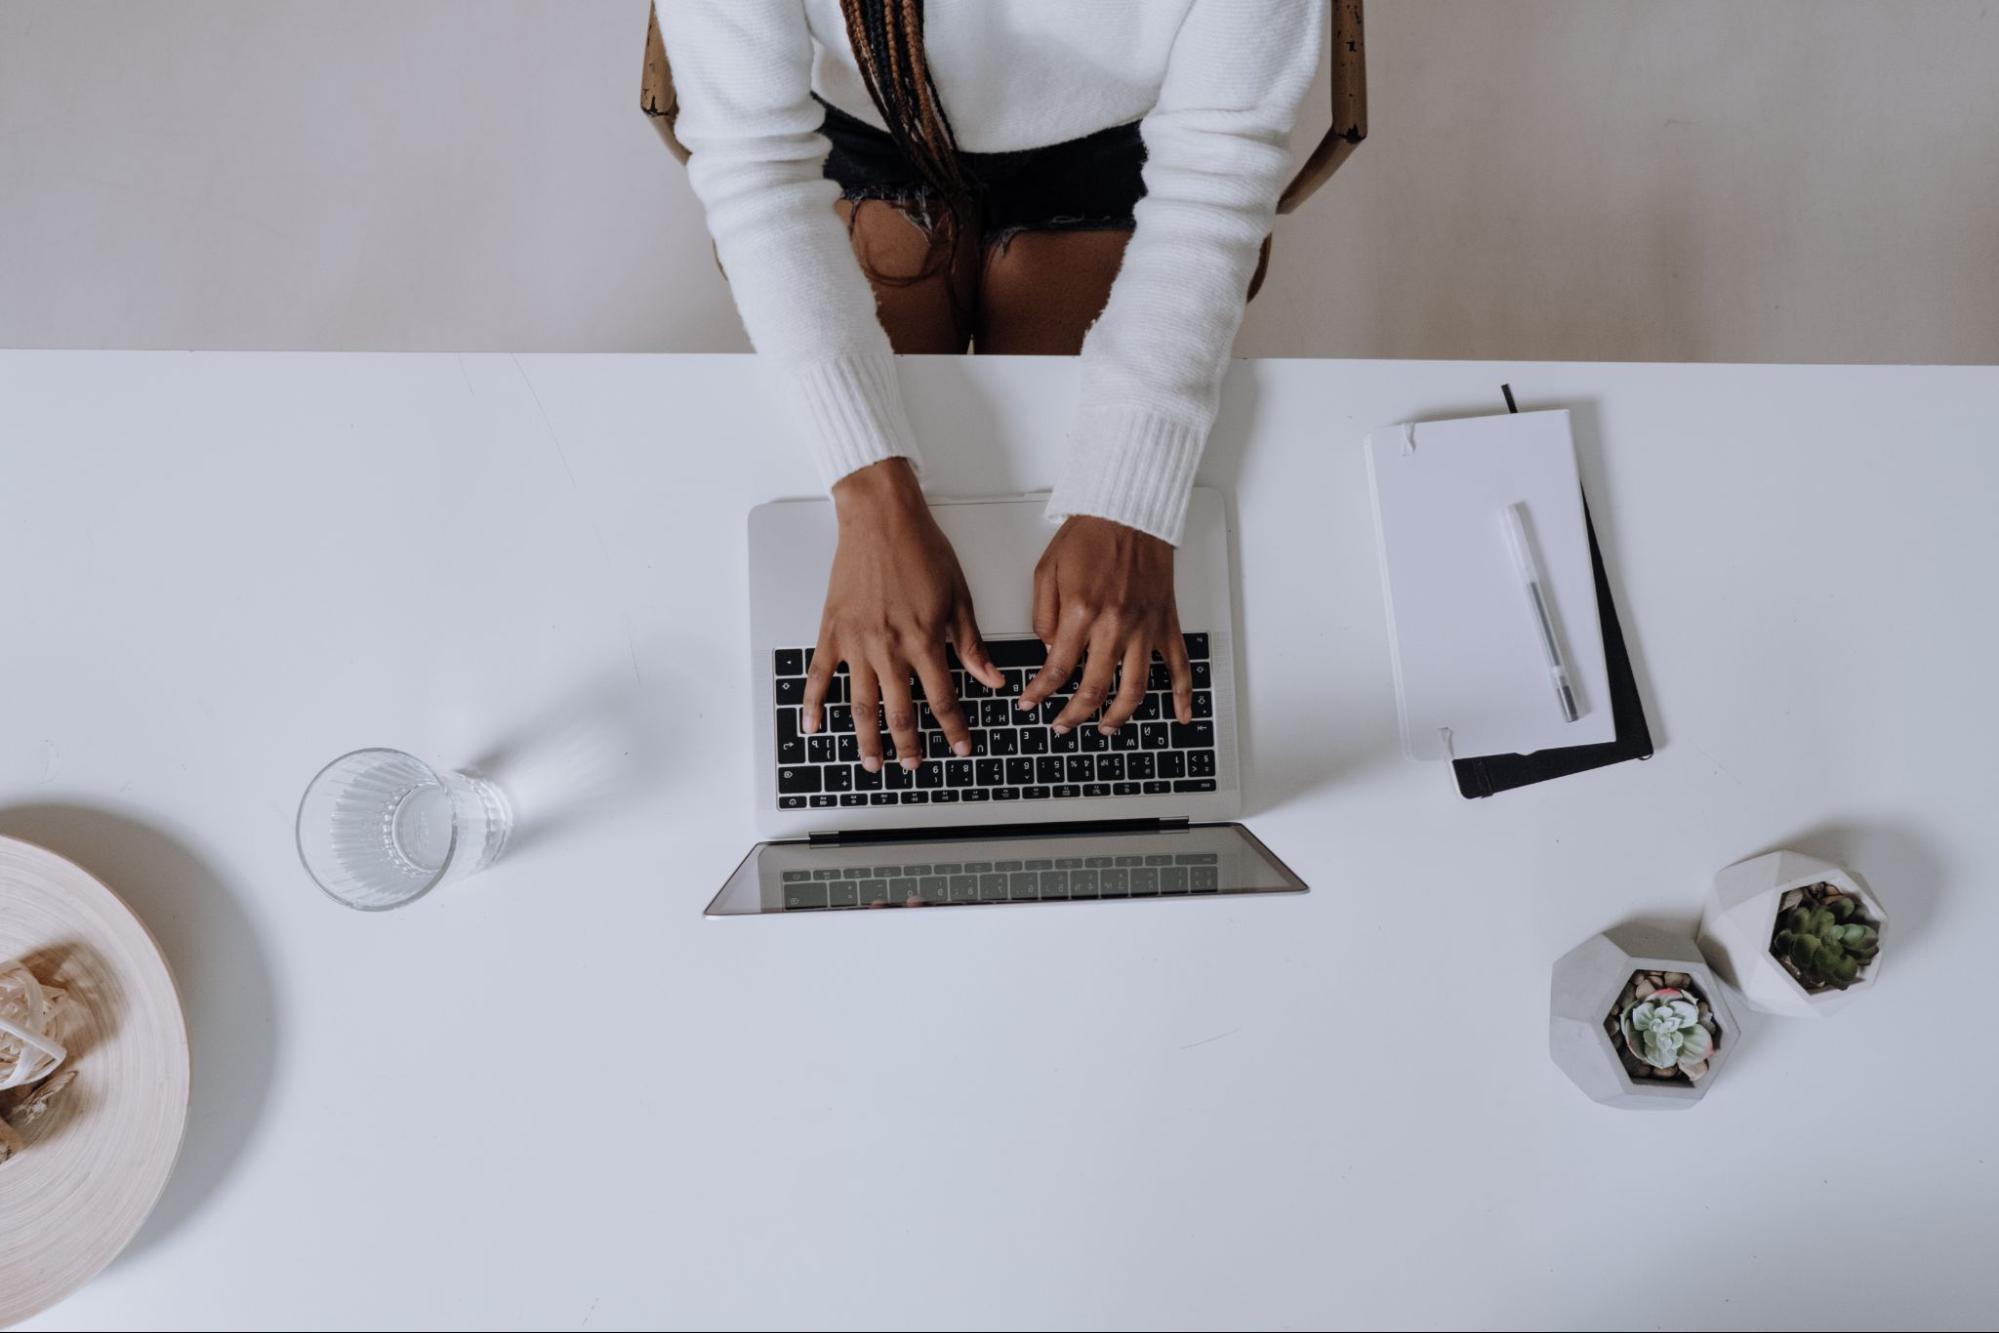 Is Blogging Still Good for Content Marketing?